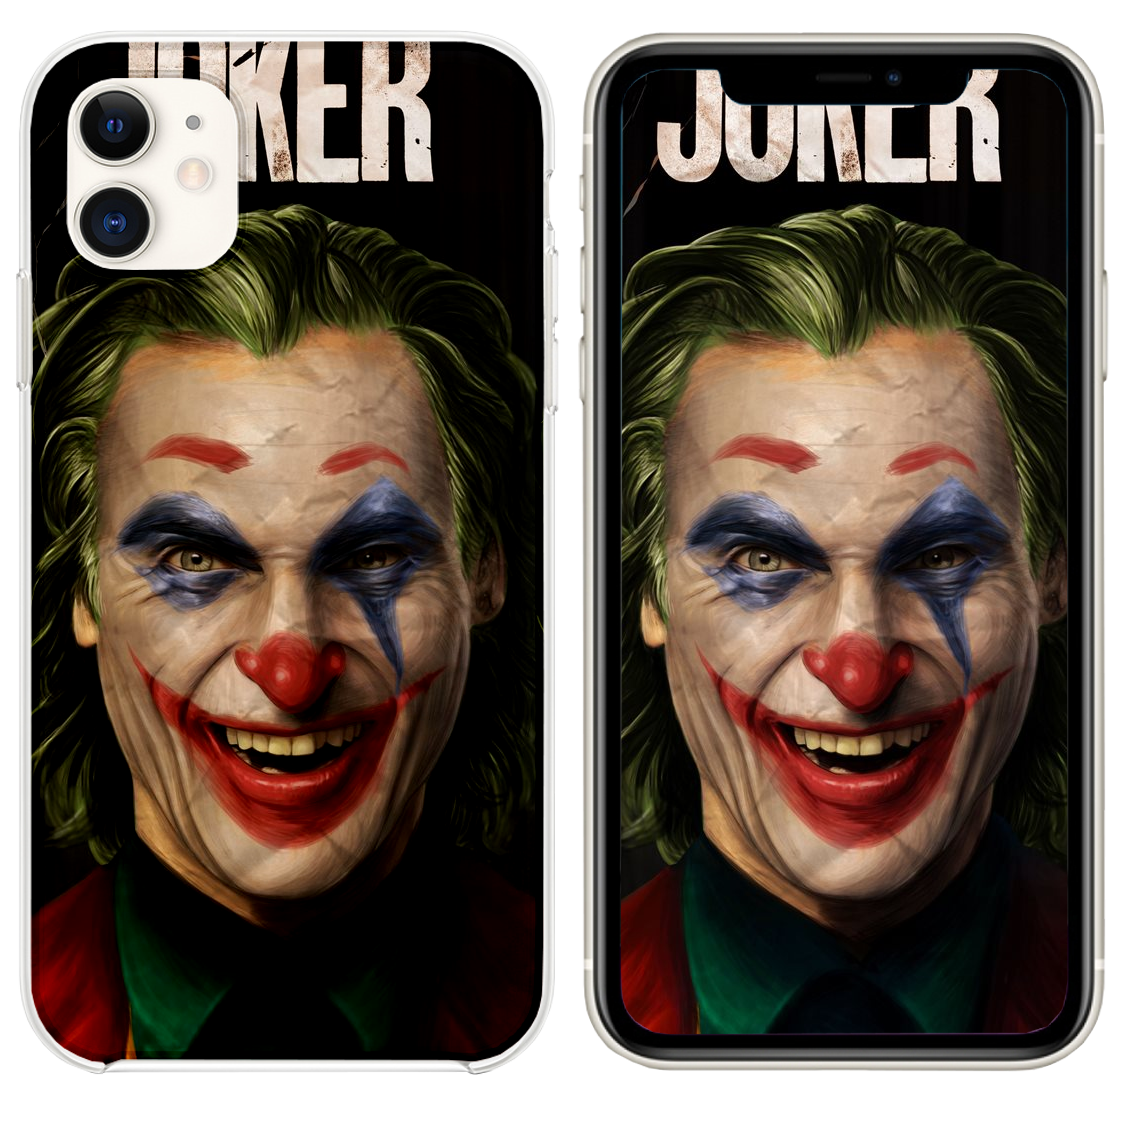 5k Joker Joaquin Phoenix 2019 Iphone 11 Case Iphone 11 Joker Iphone